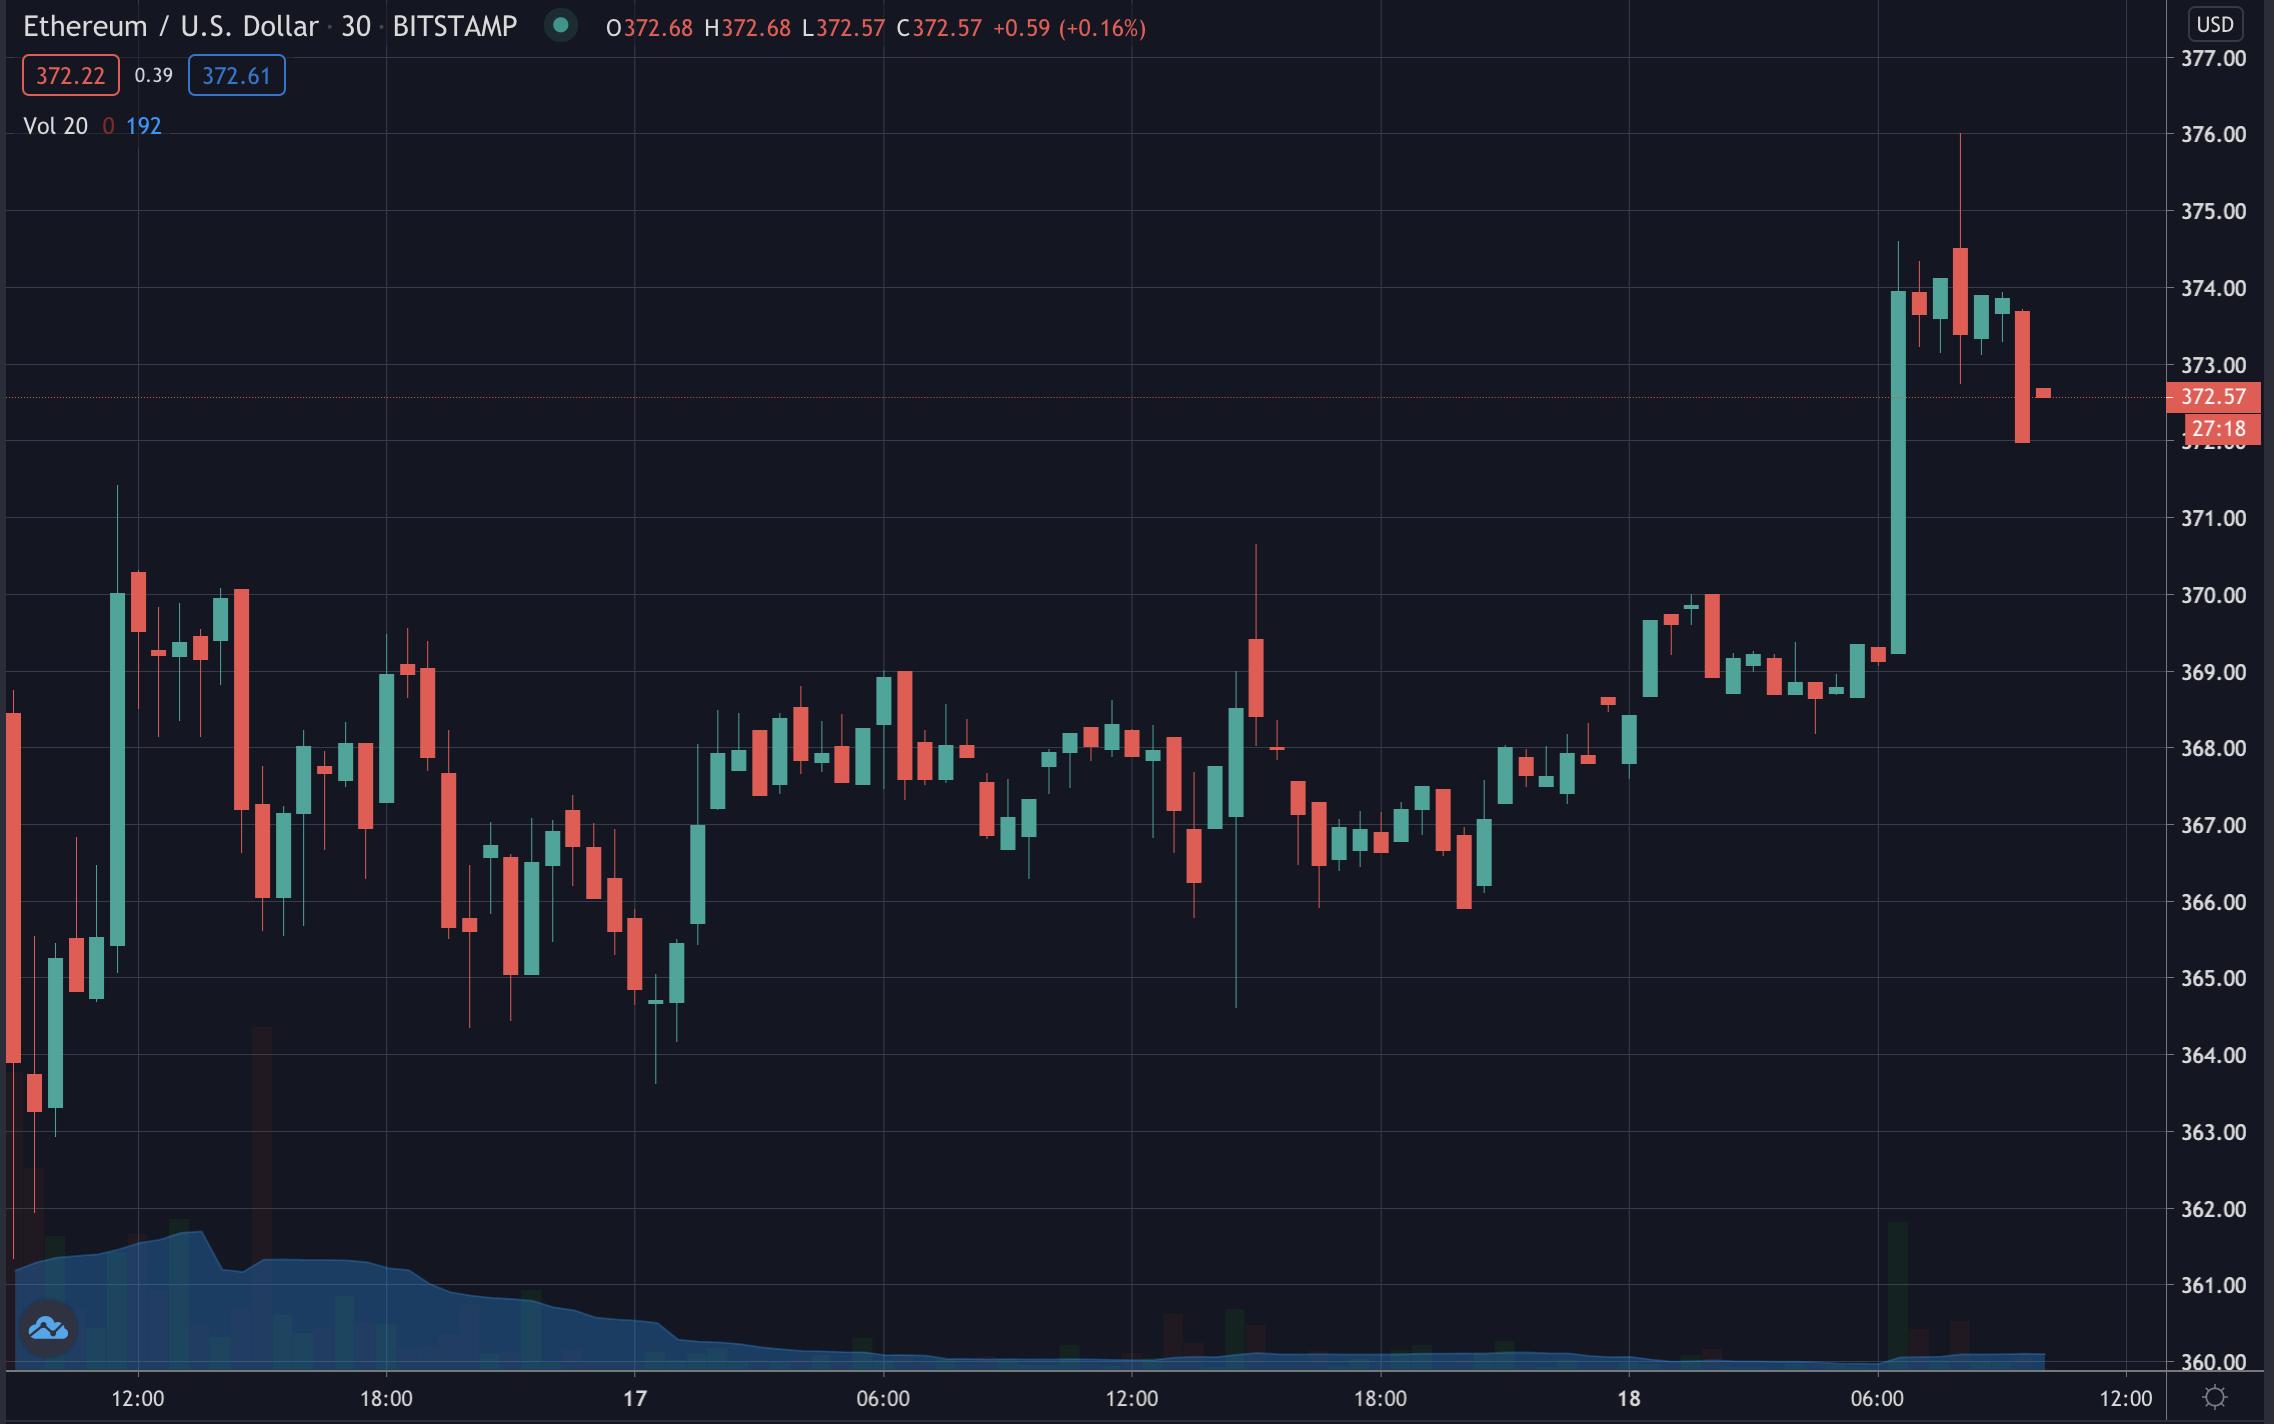 Ethereum's price, October 2020